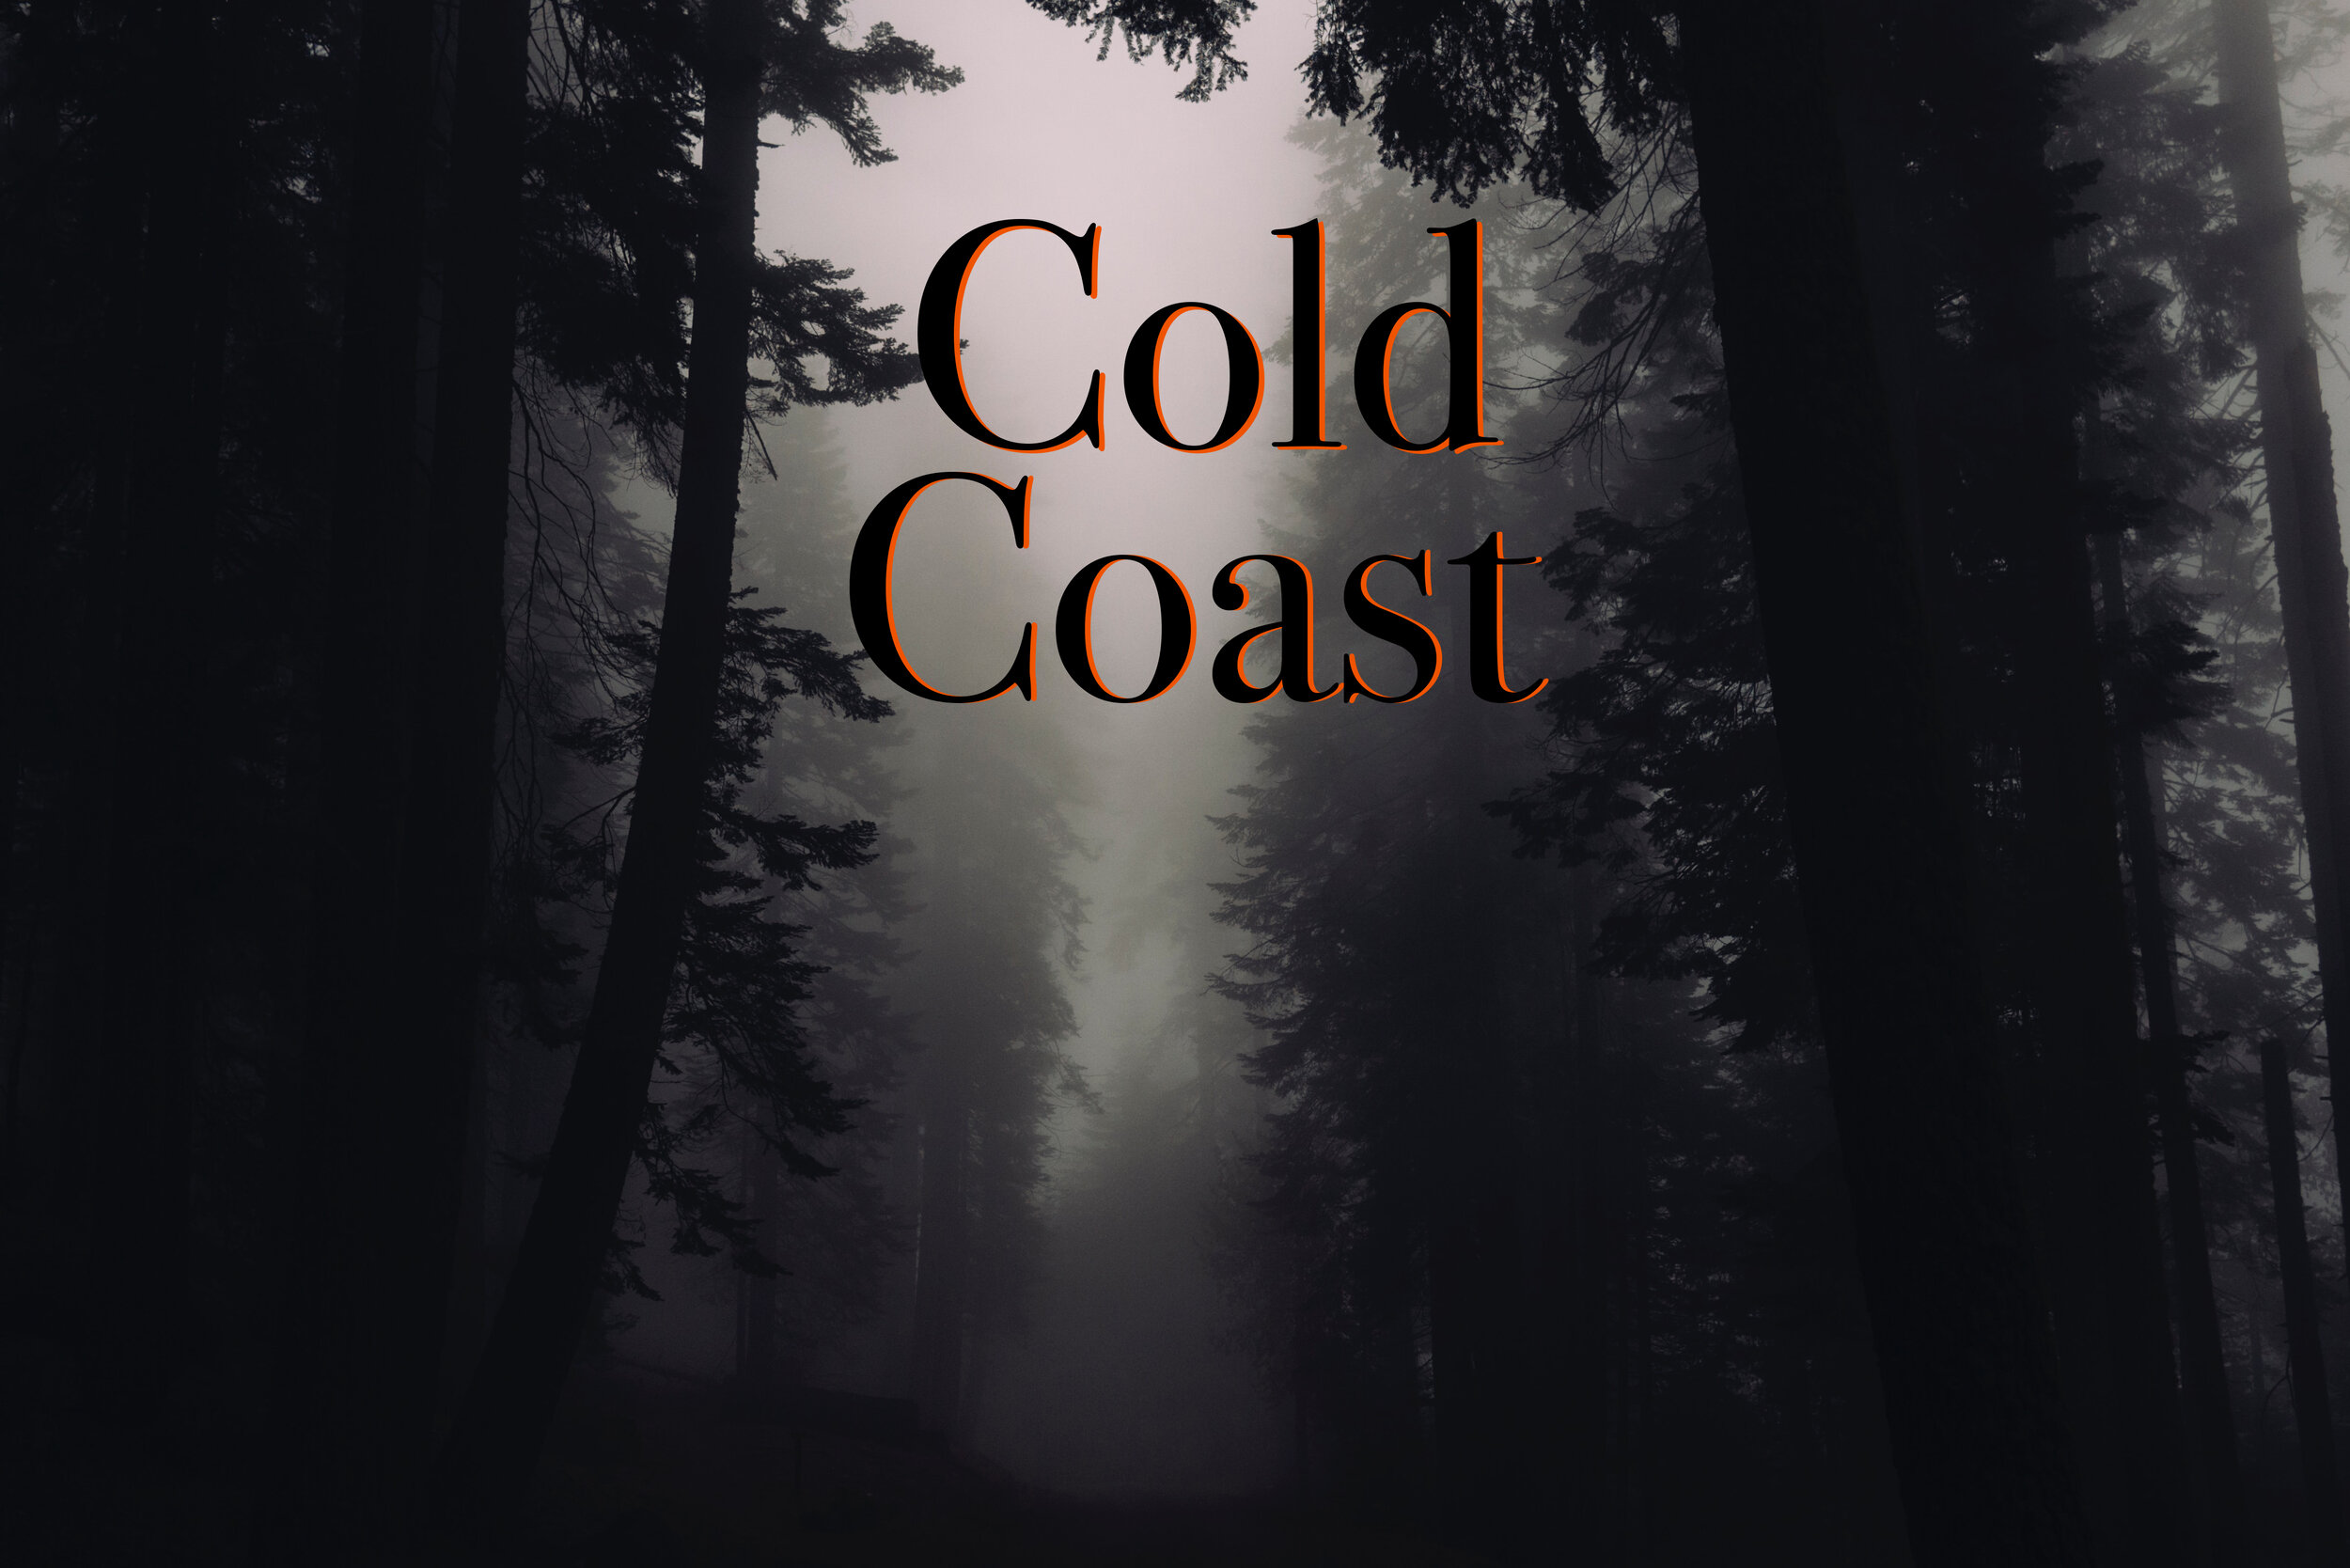 coldcoastprofilepic.jpg